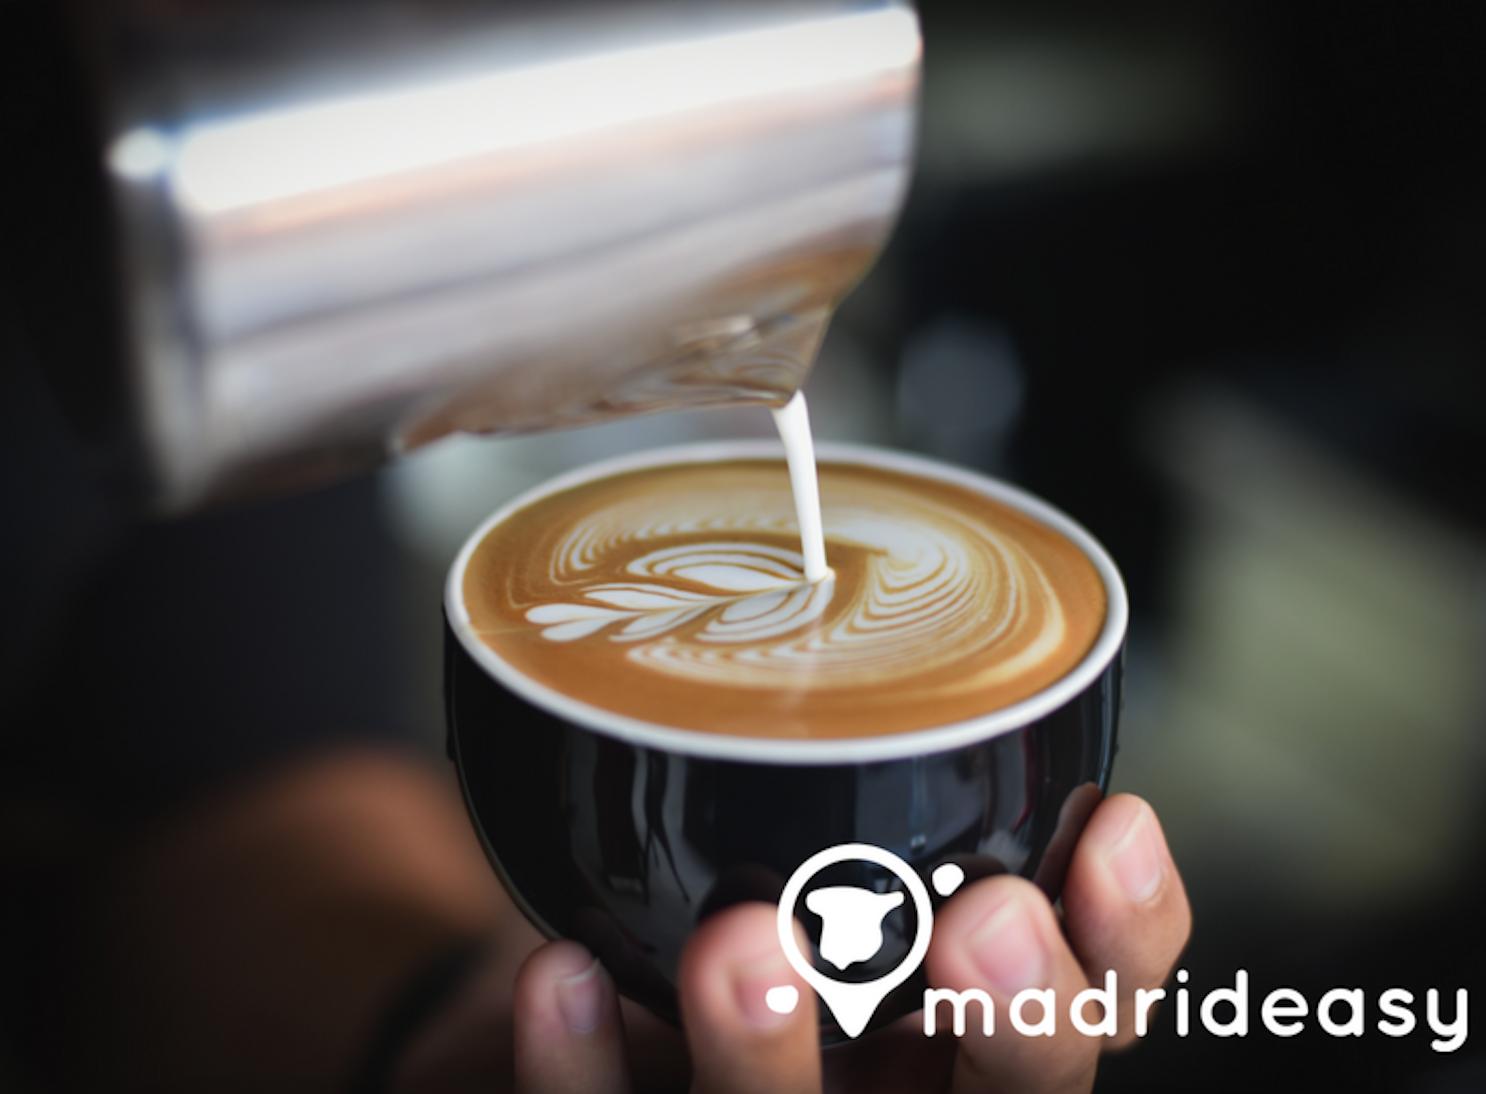 #coffe #cafe #madrid #madrideasy